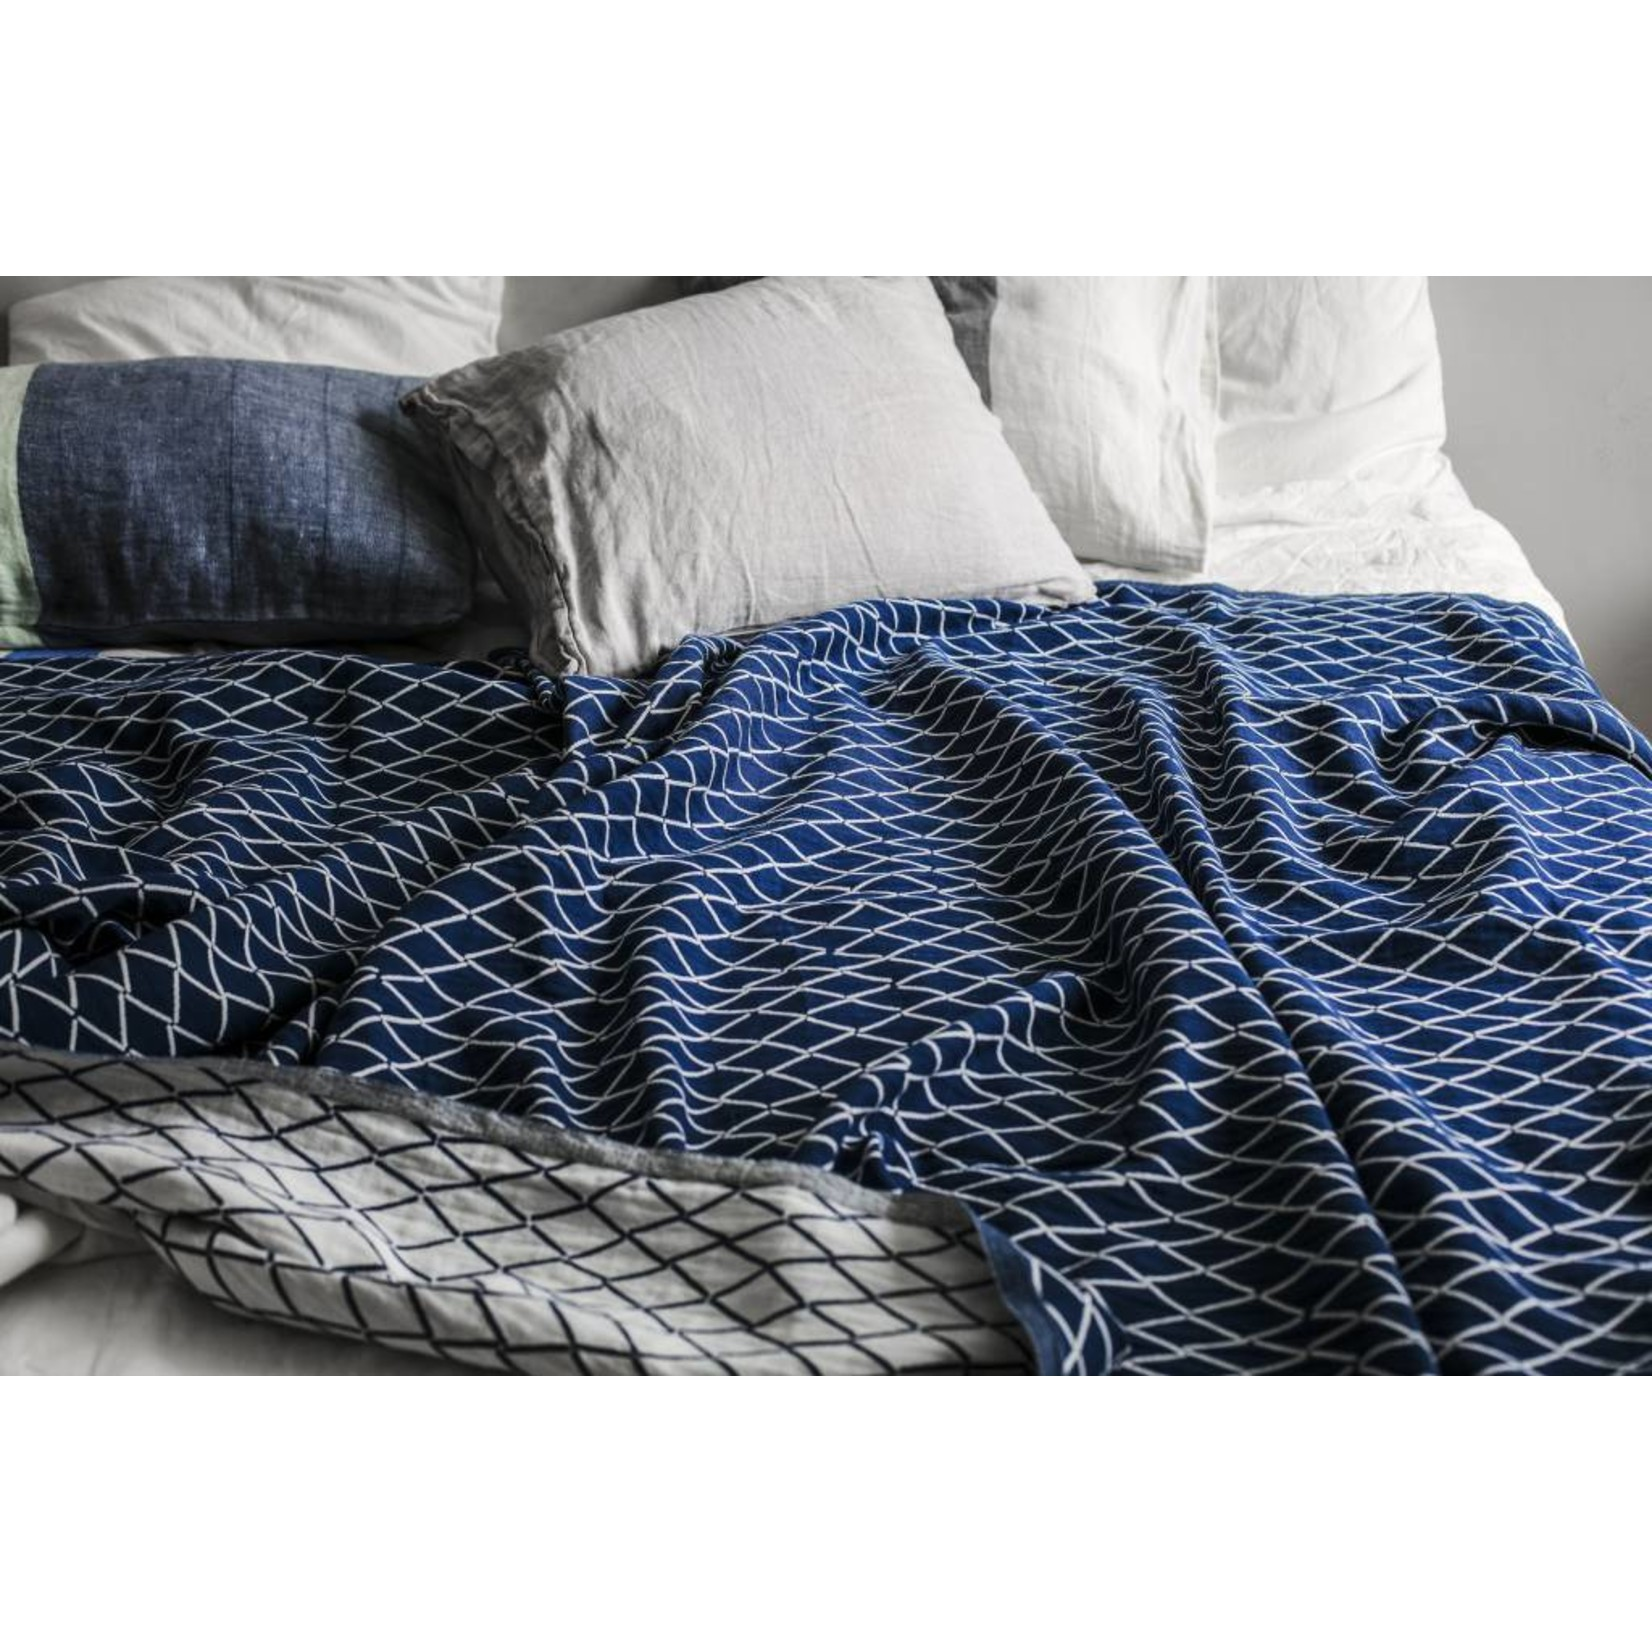 Lapuan Kankurit ESKIMO tablecloth & blanket linen & organic cotton - blue & white